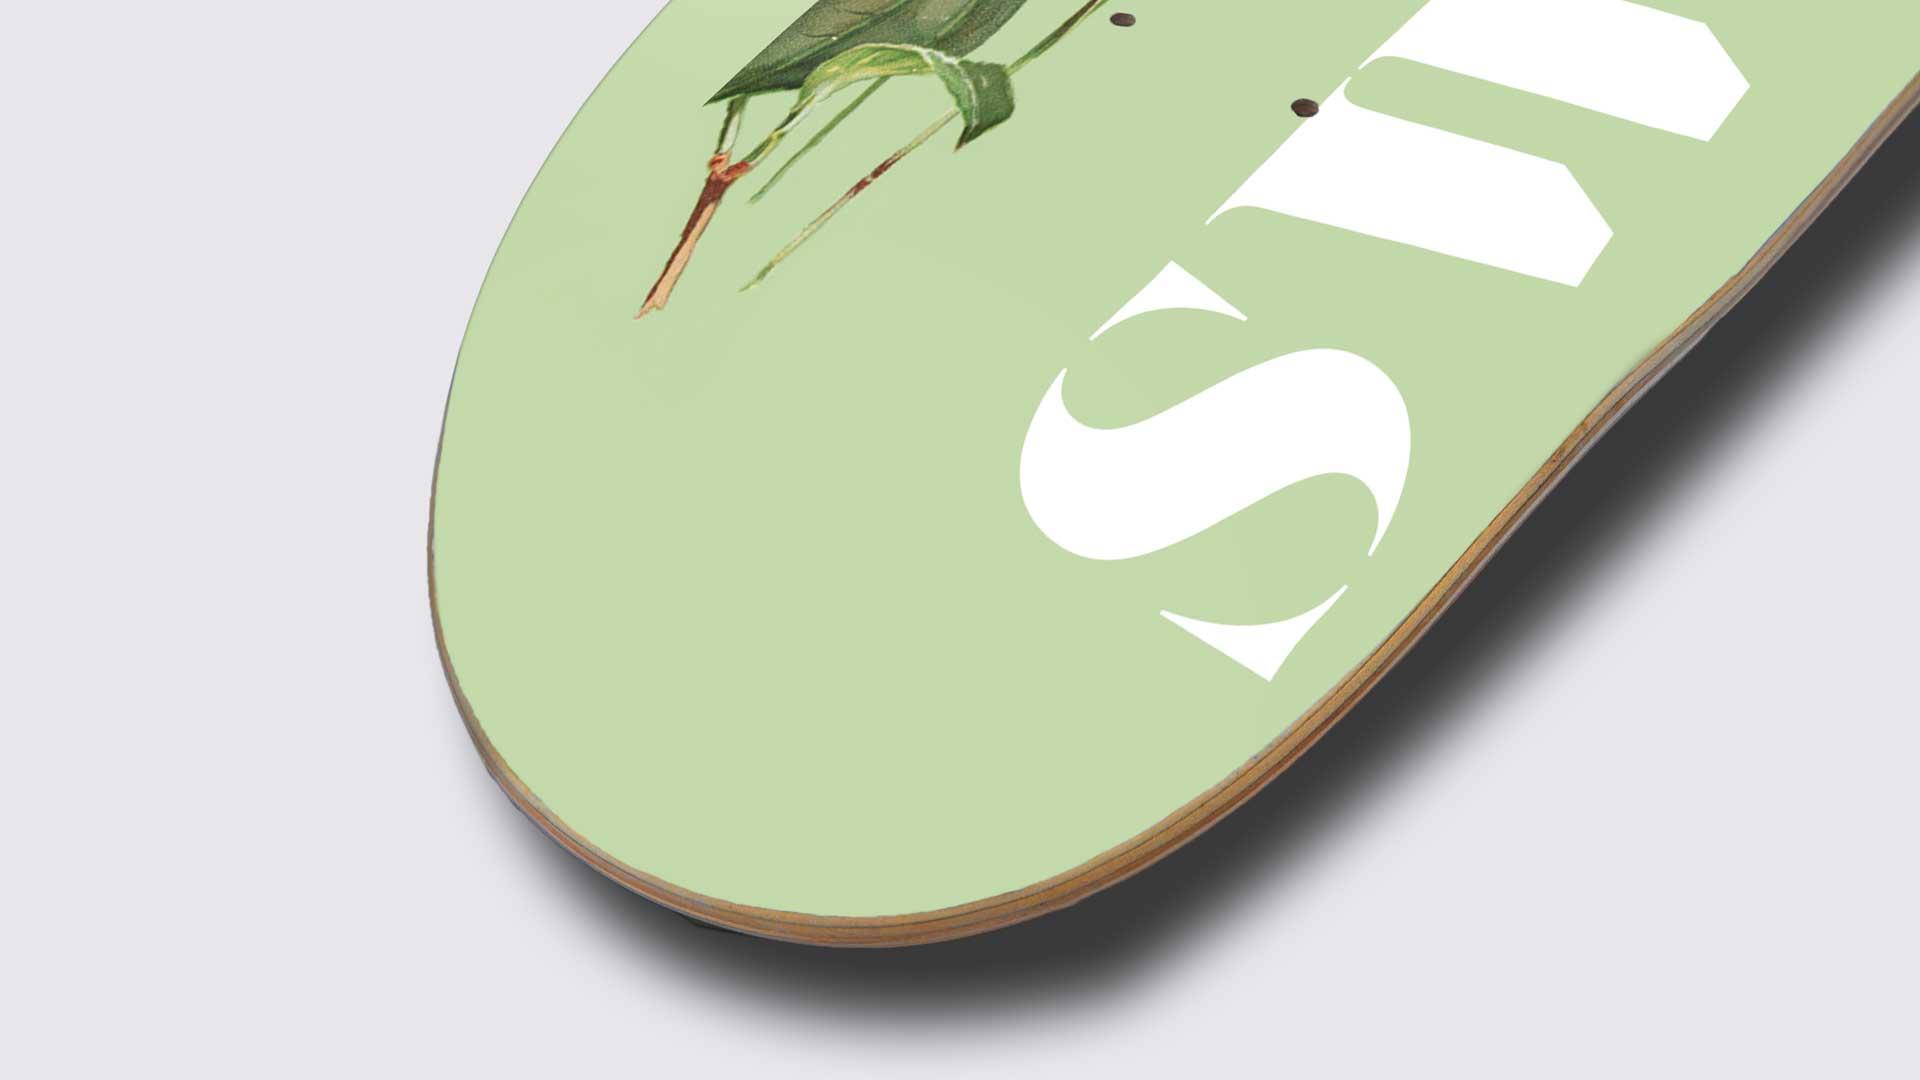 5_2_deck_skateboards_graphicdesign